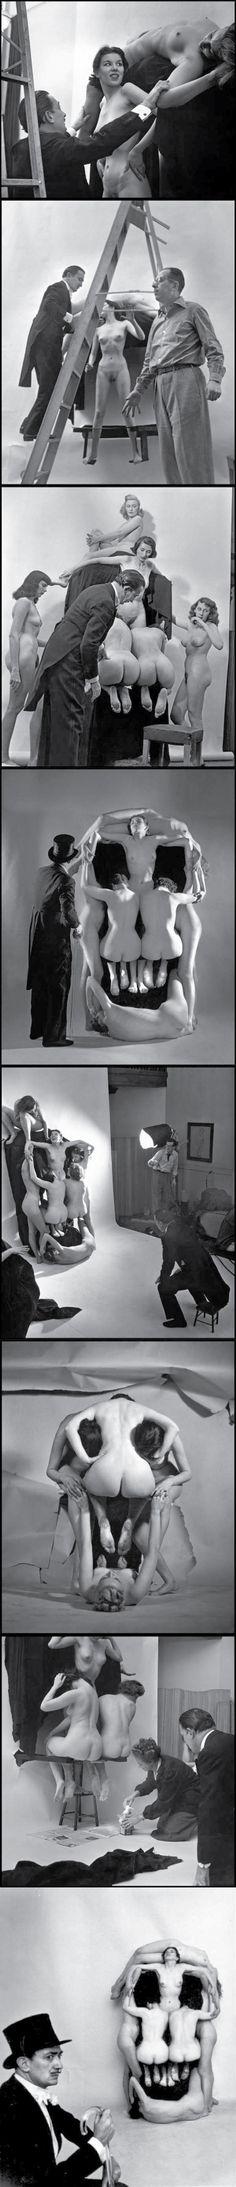 "IN VOLUPTAS MORS"" 1951 Salvador Dalí and Philippe Halsman."